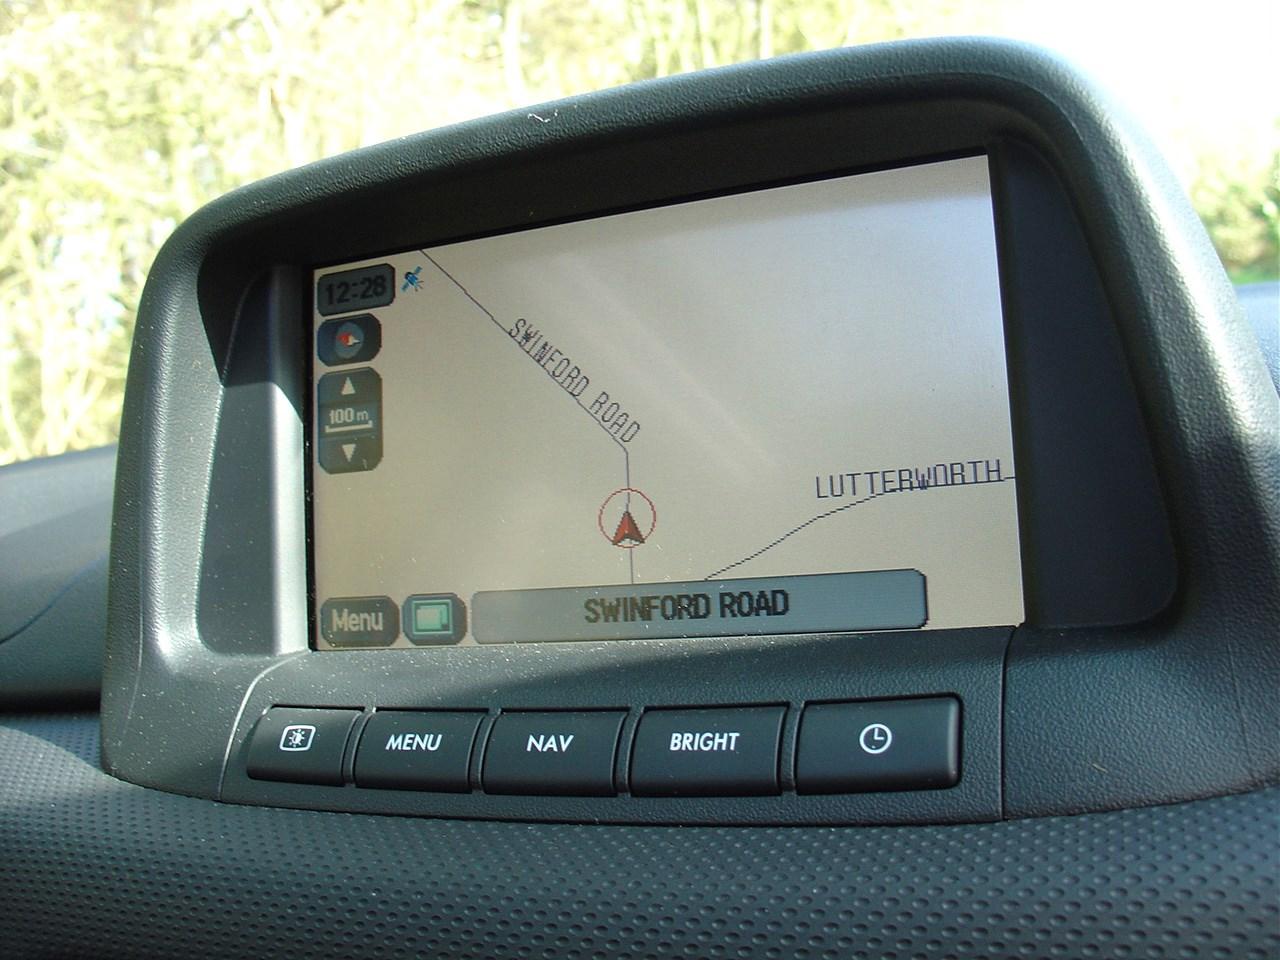 2003 Subaru Forester Radio Wiring Diagram Solutions 06 Interior